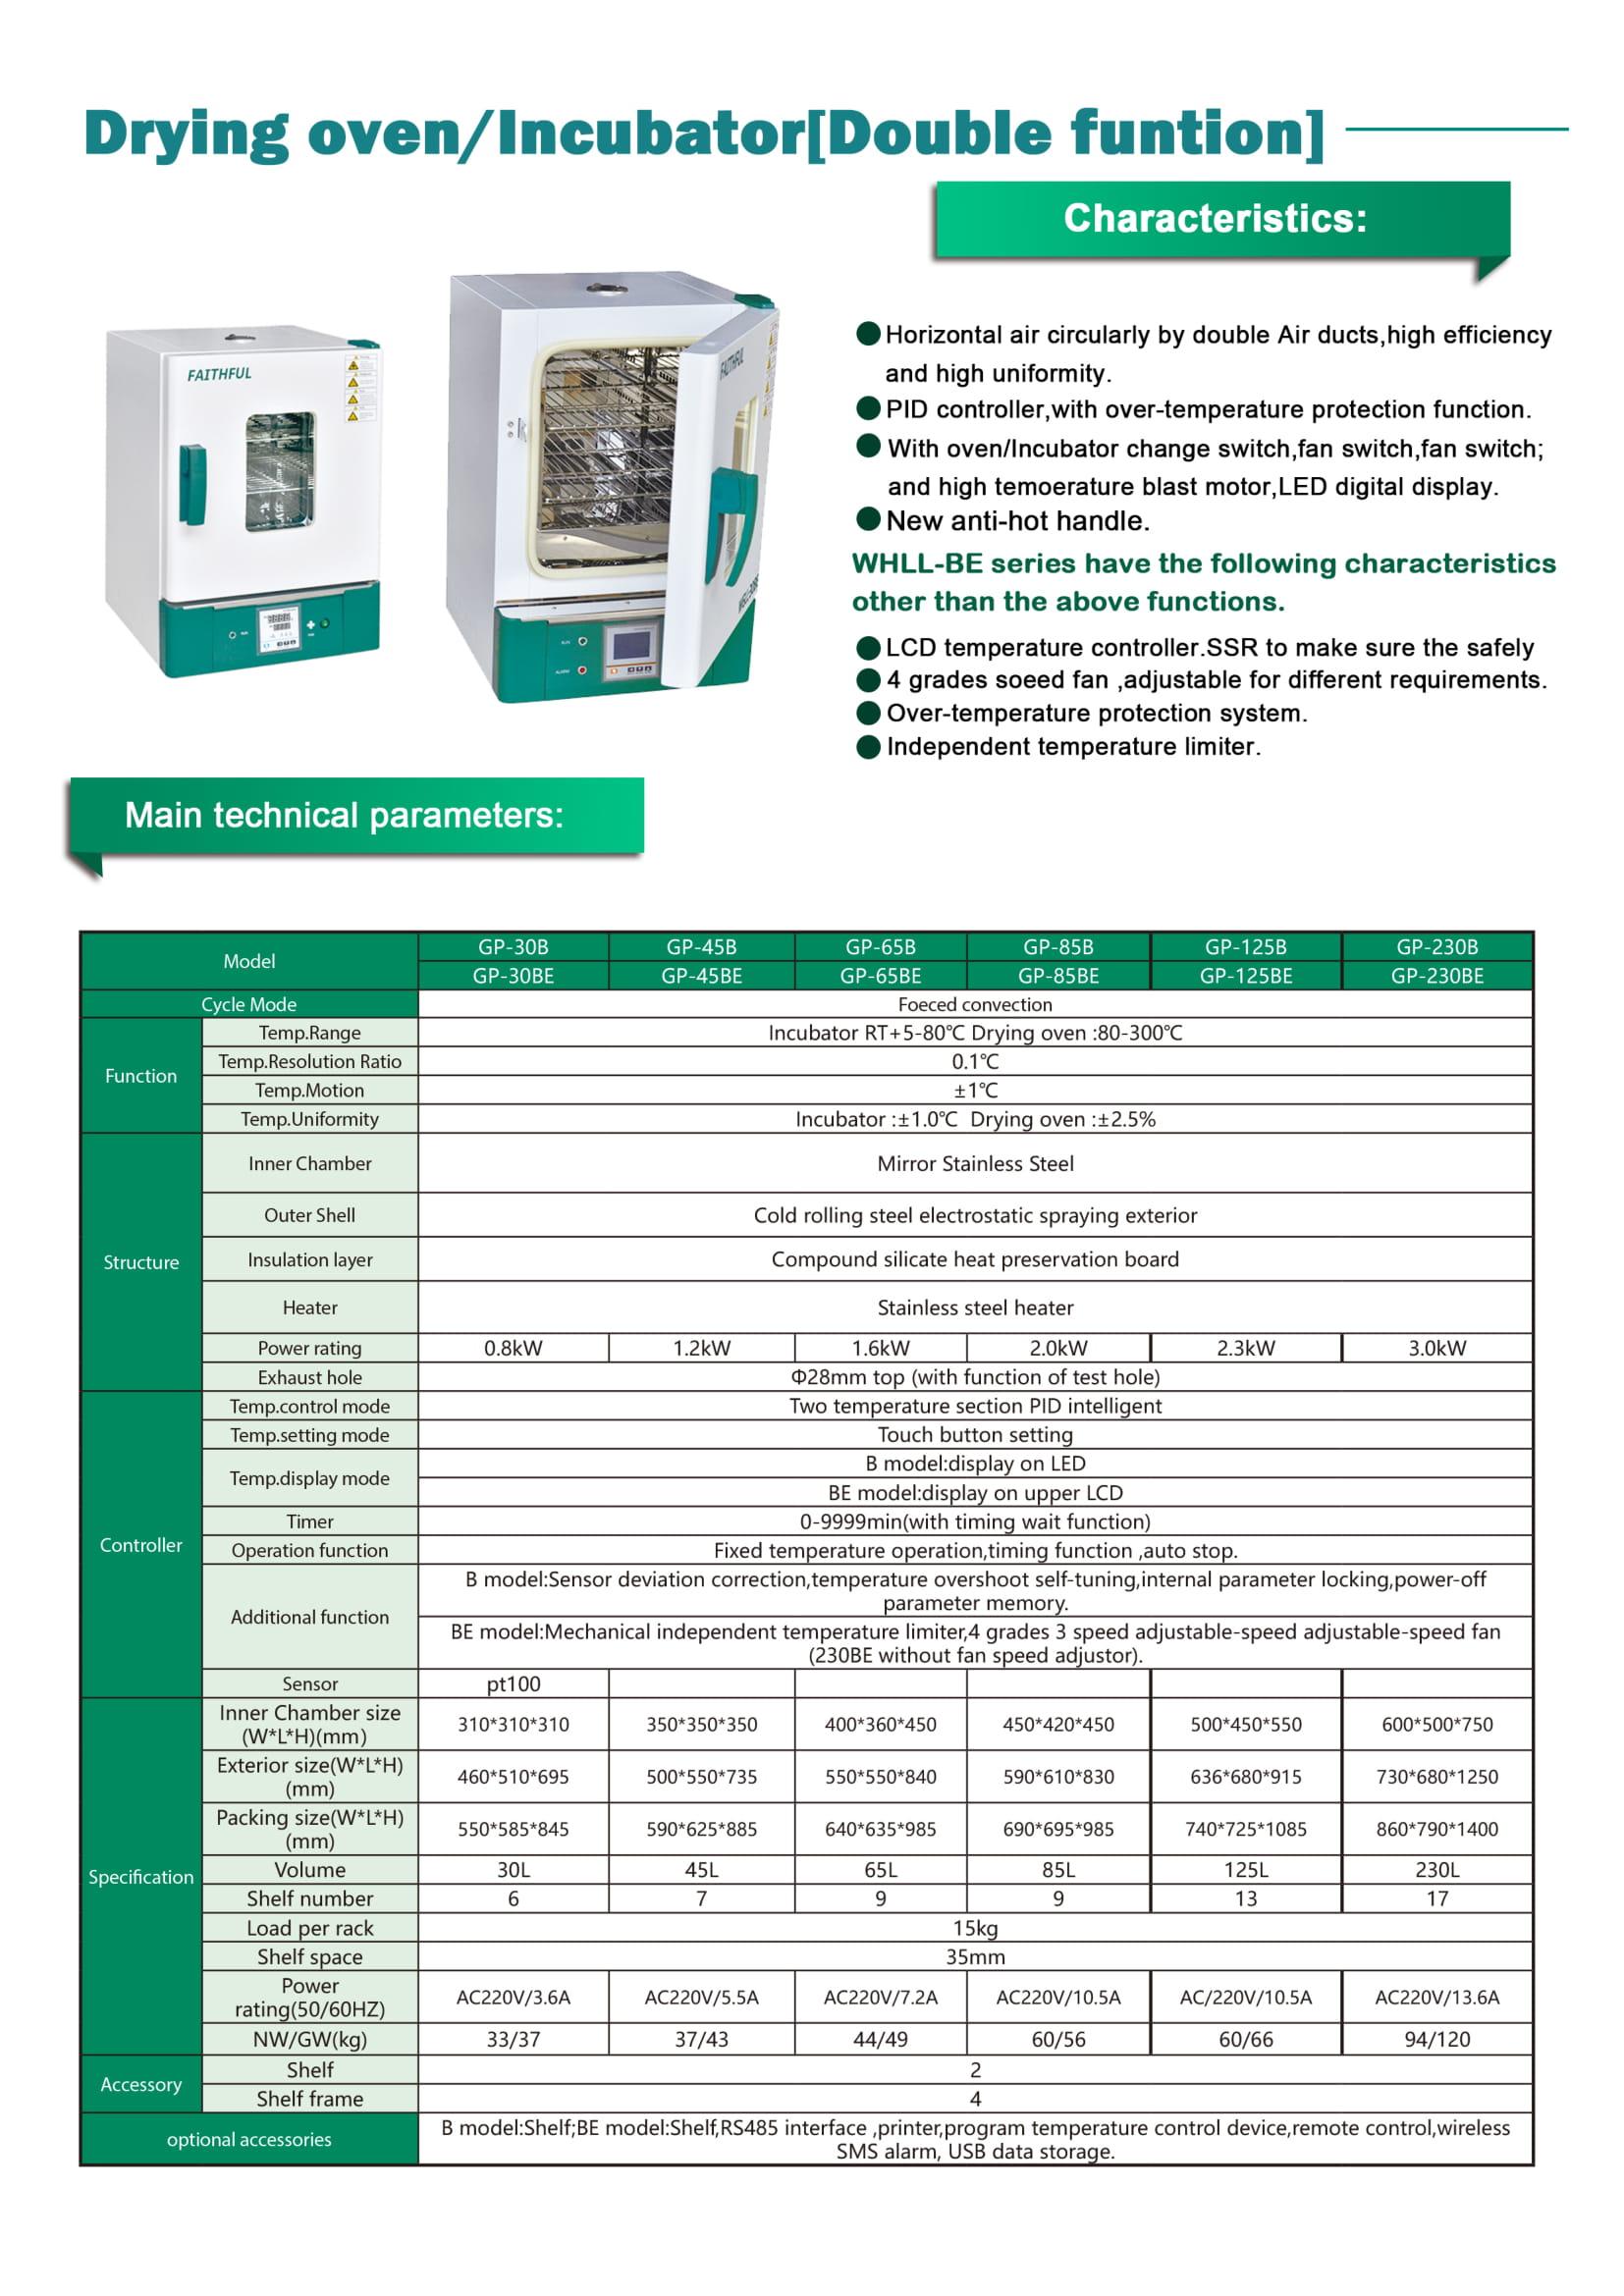 Drying-Oven-Incubator-Double-Function